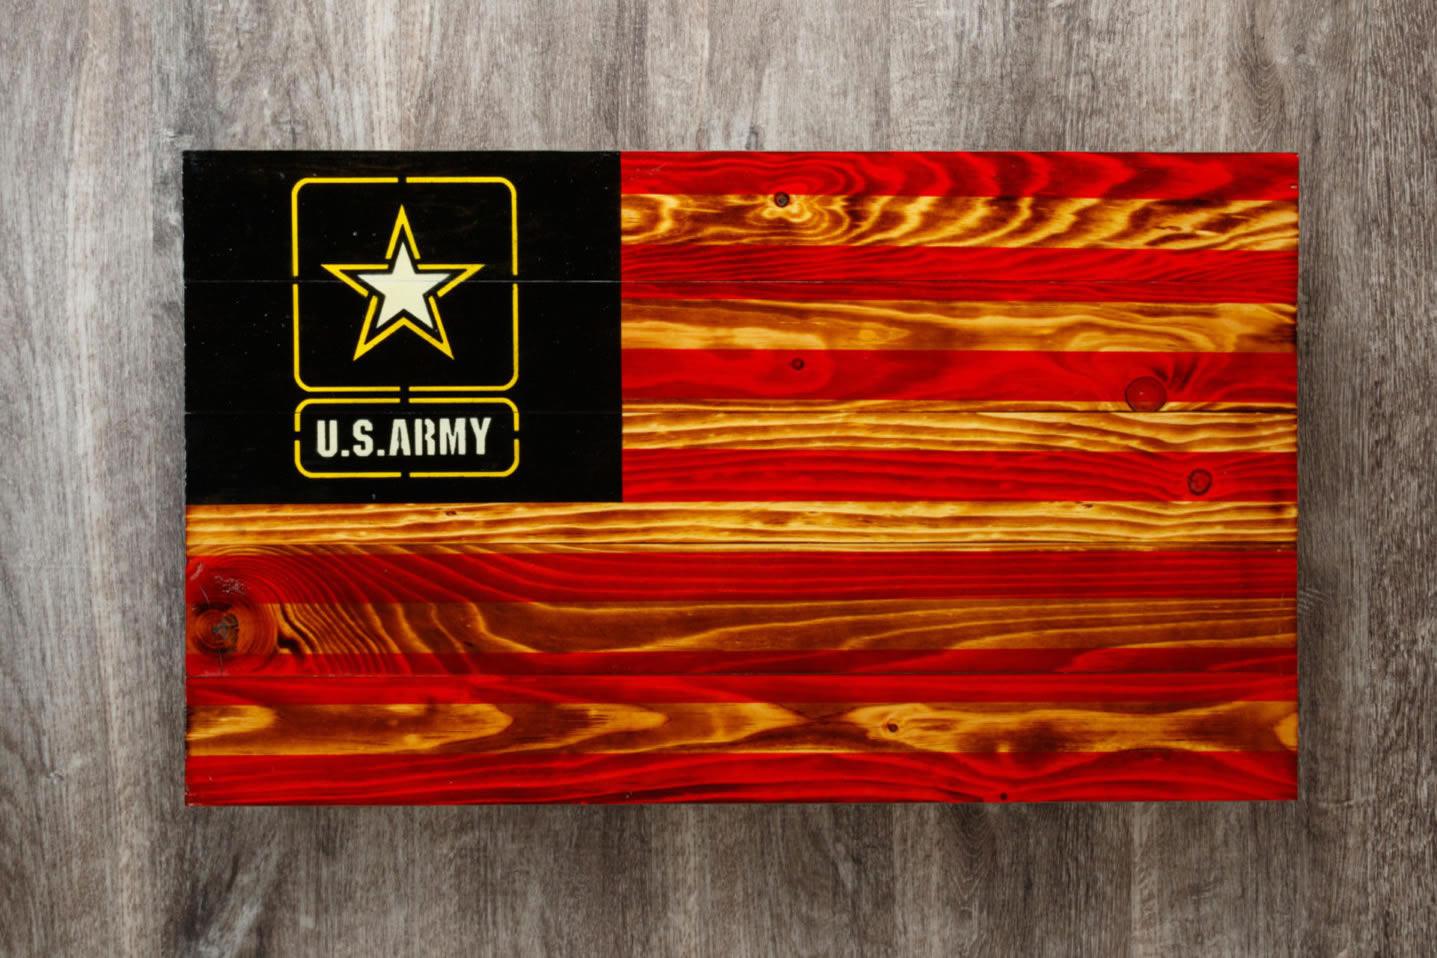 Army Wooden American flag wall art